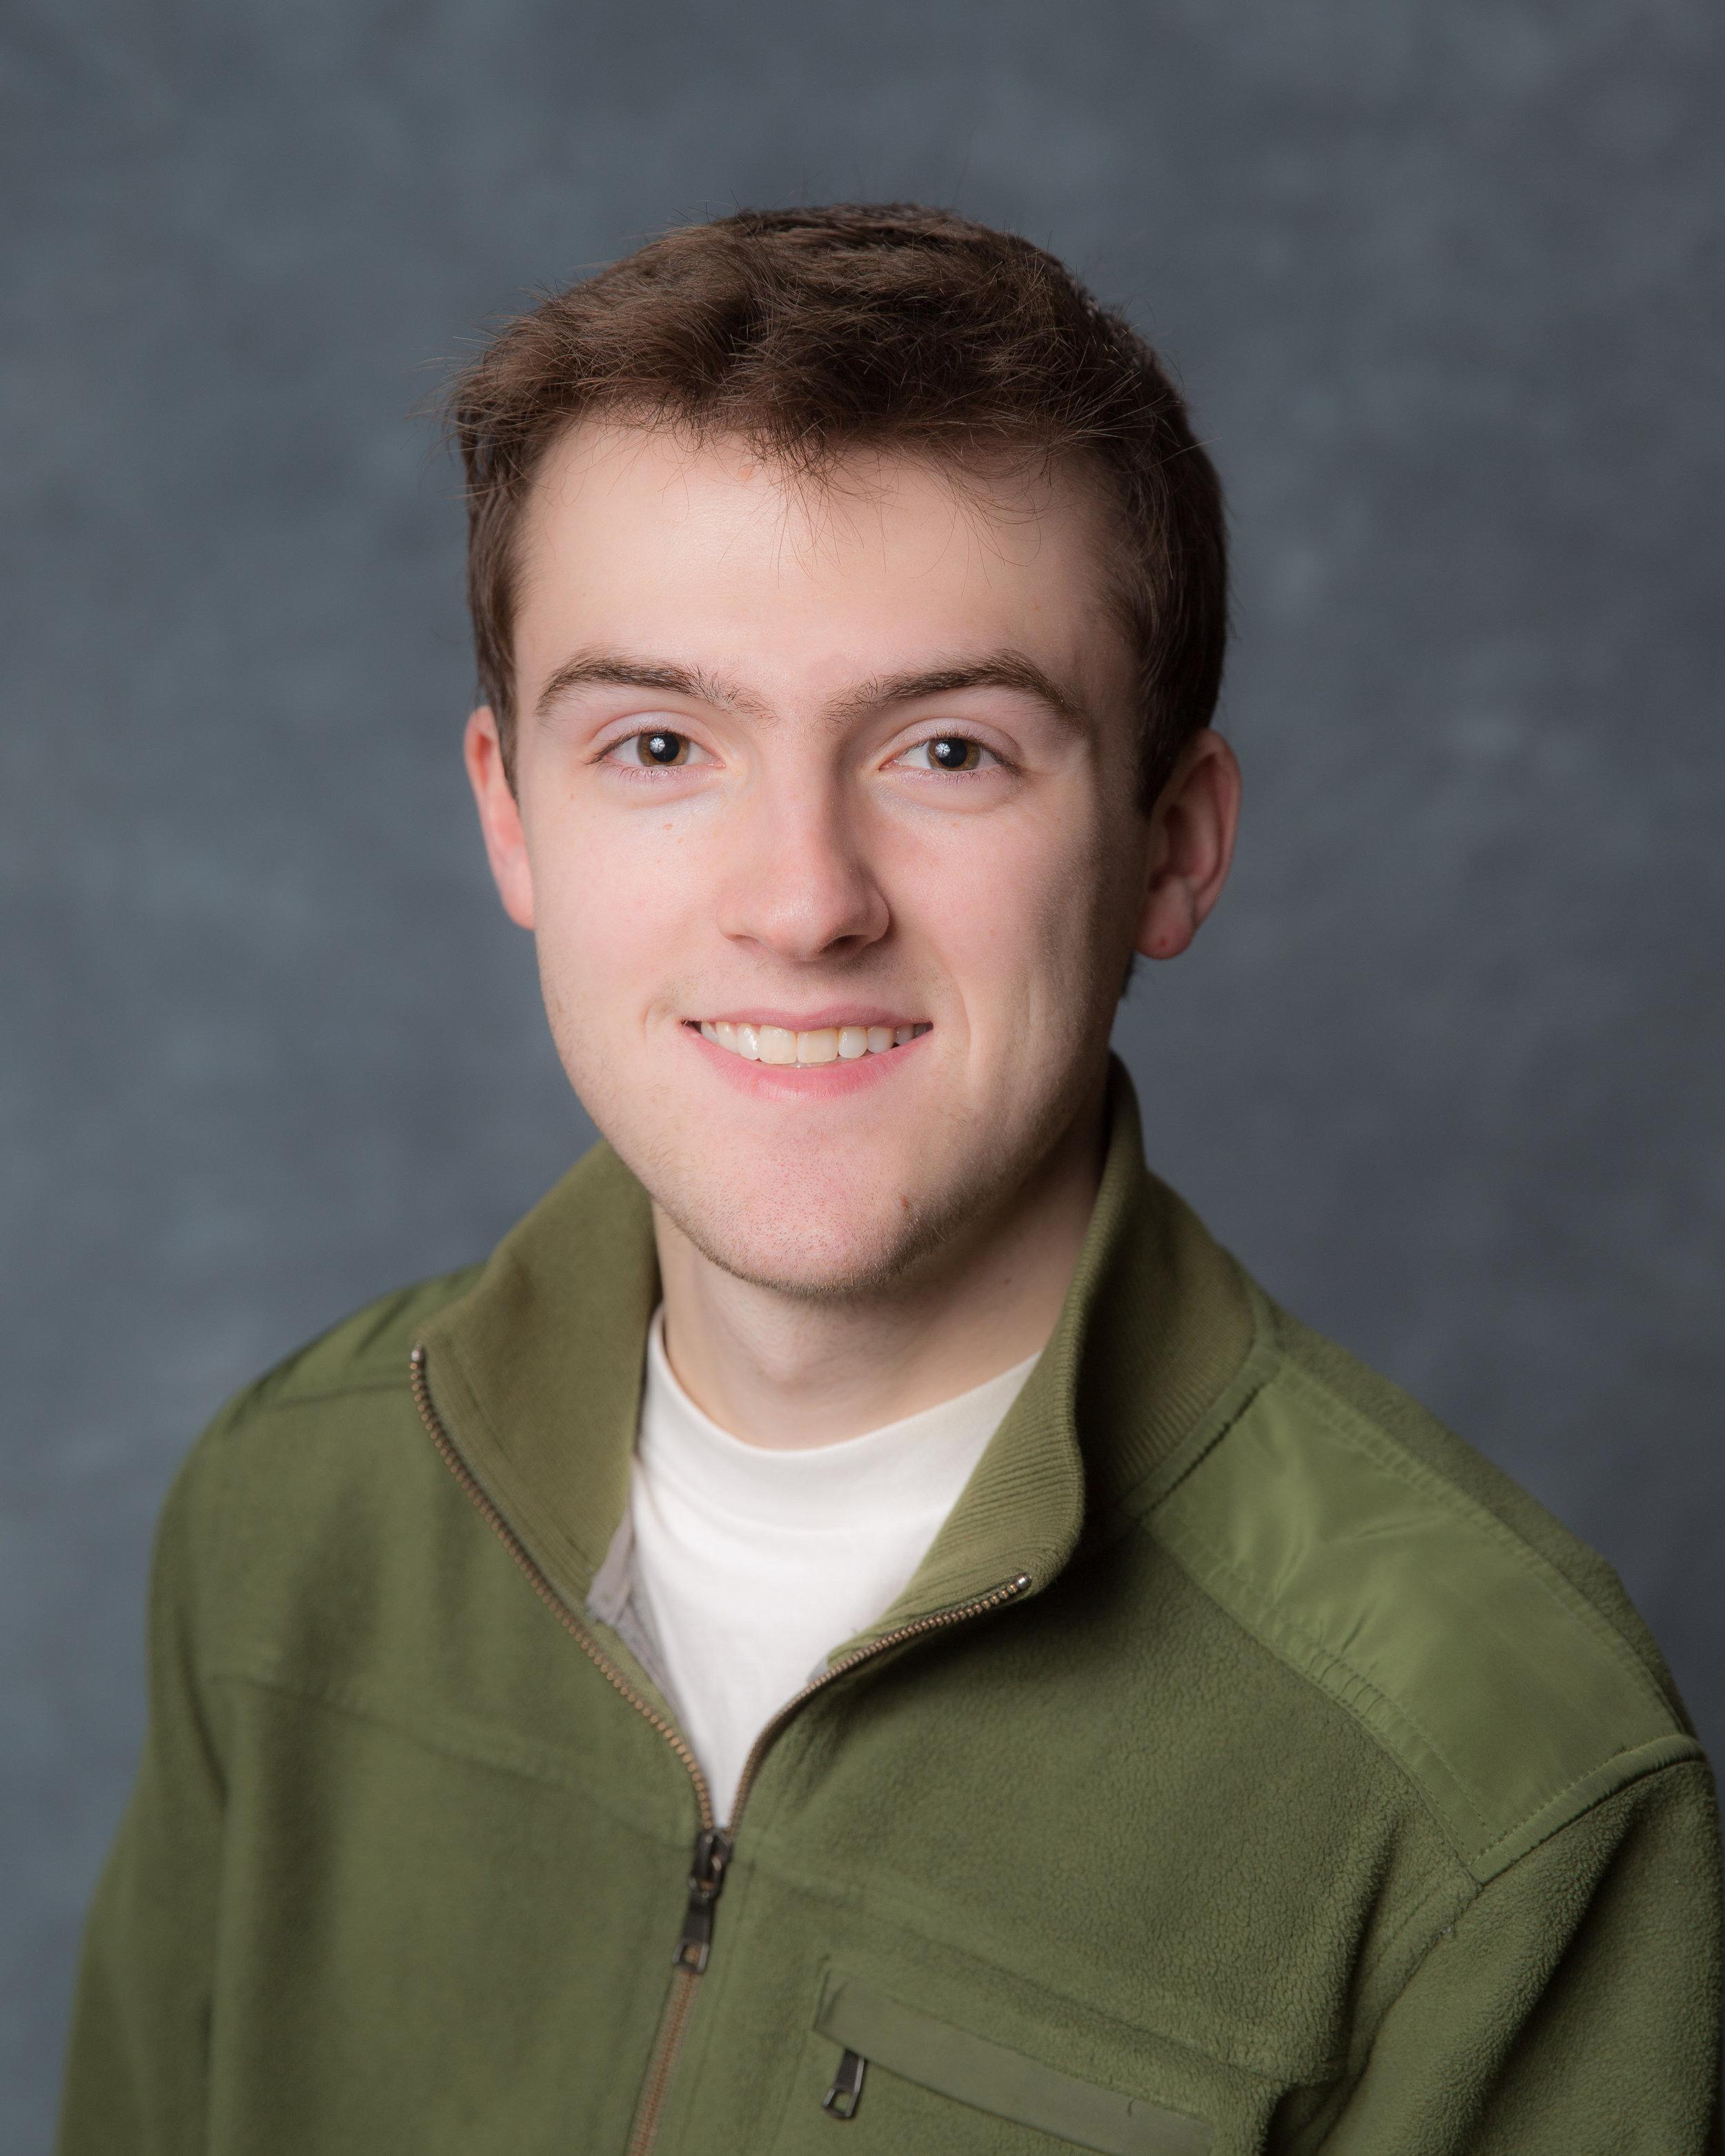 Nathan Trombley - MS, GeographyCurrent Employment: Intern, Oak Ridge National LaboratoryResearch: International migration and remittances